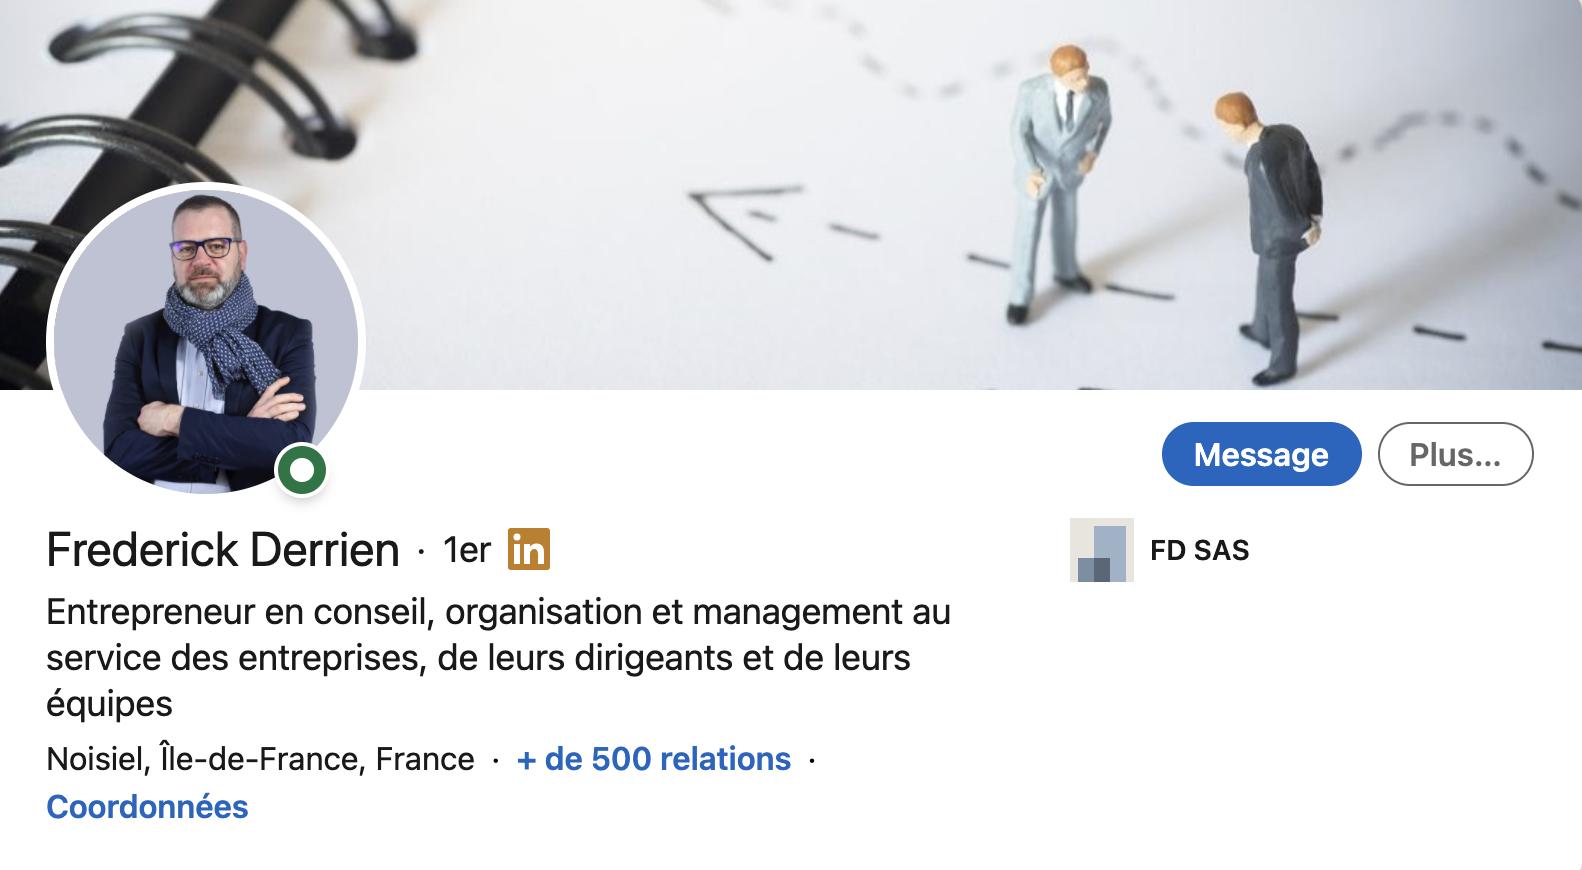 Frédérick Derrien Linkedin